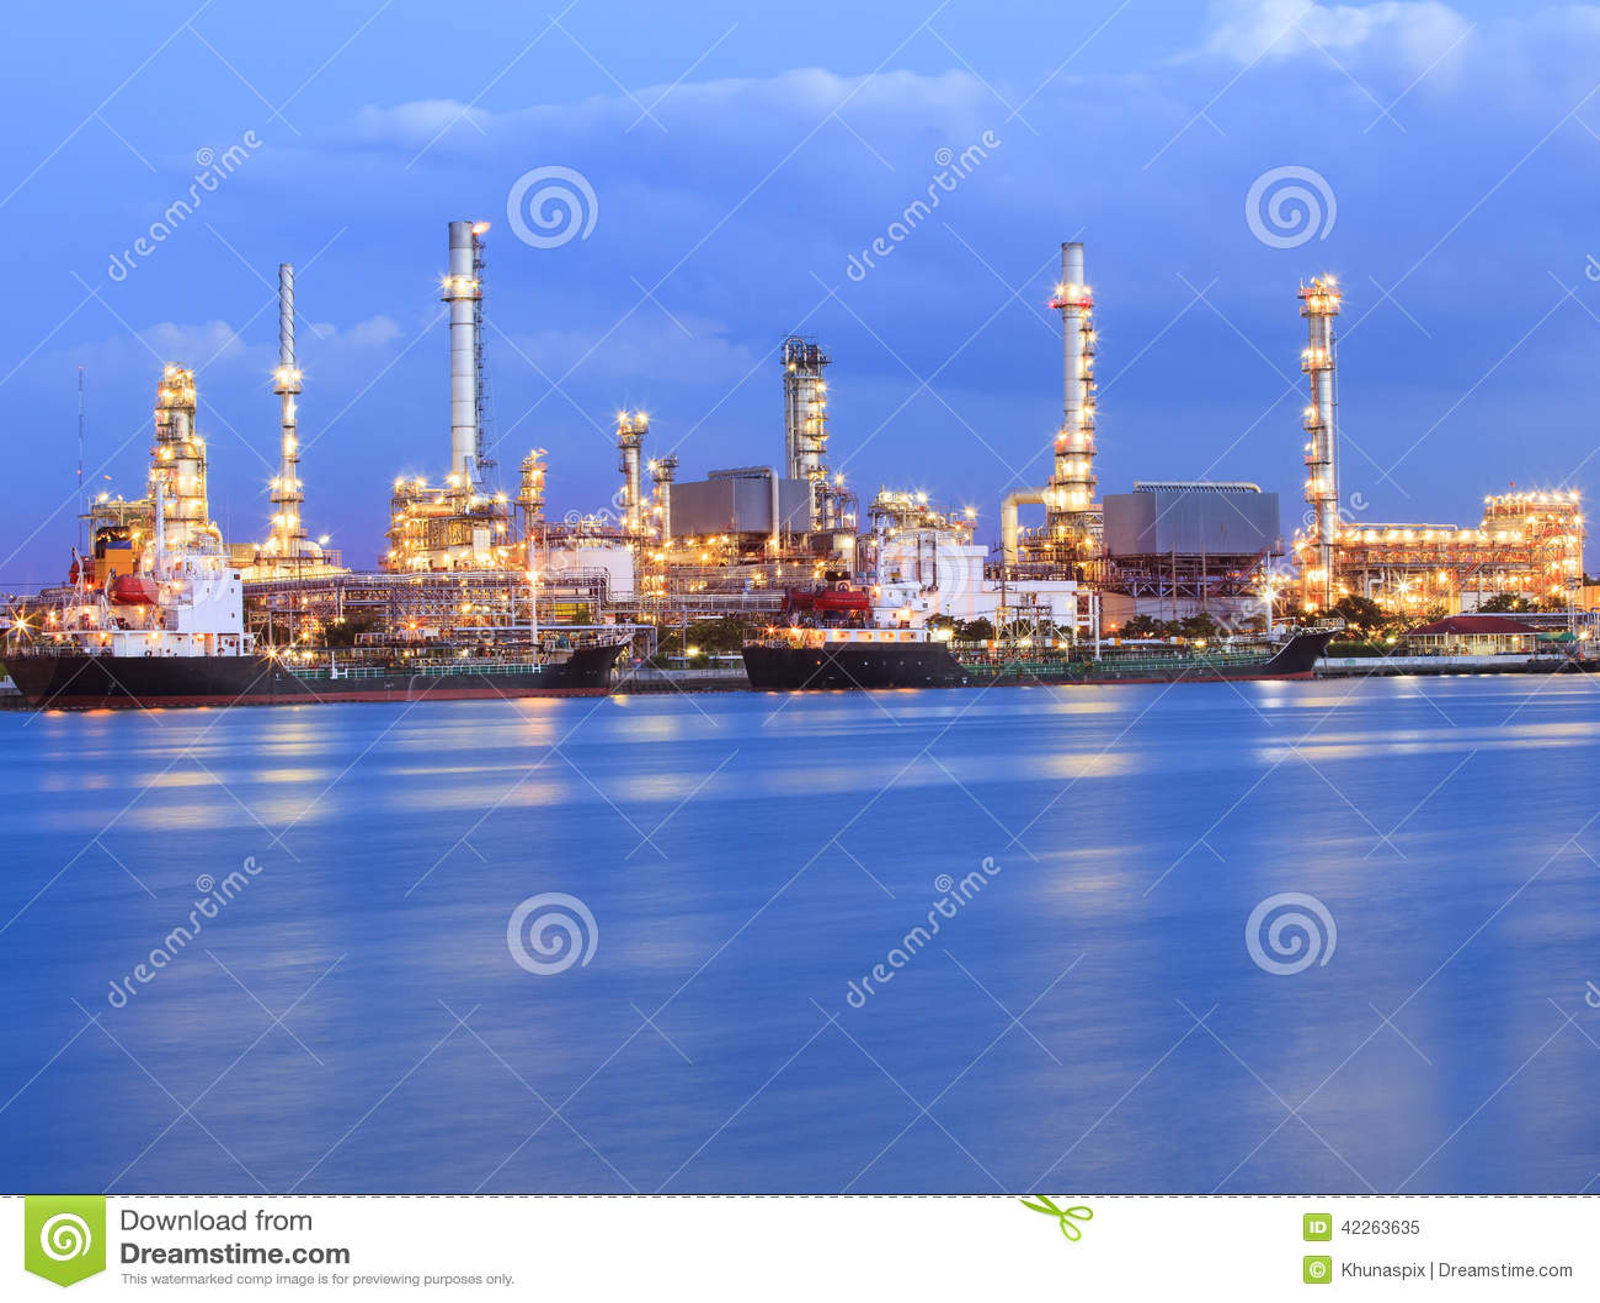 Beautiful Lighting Of Oil Refinery Industry Plant Beside